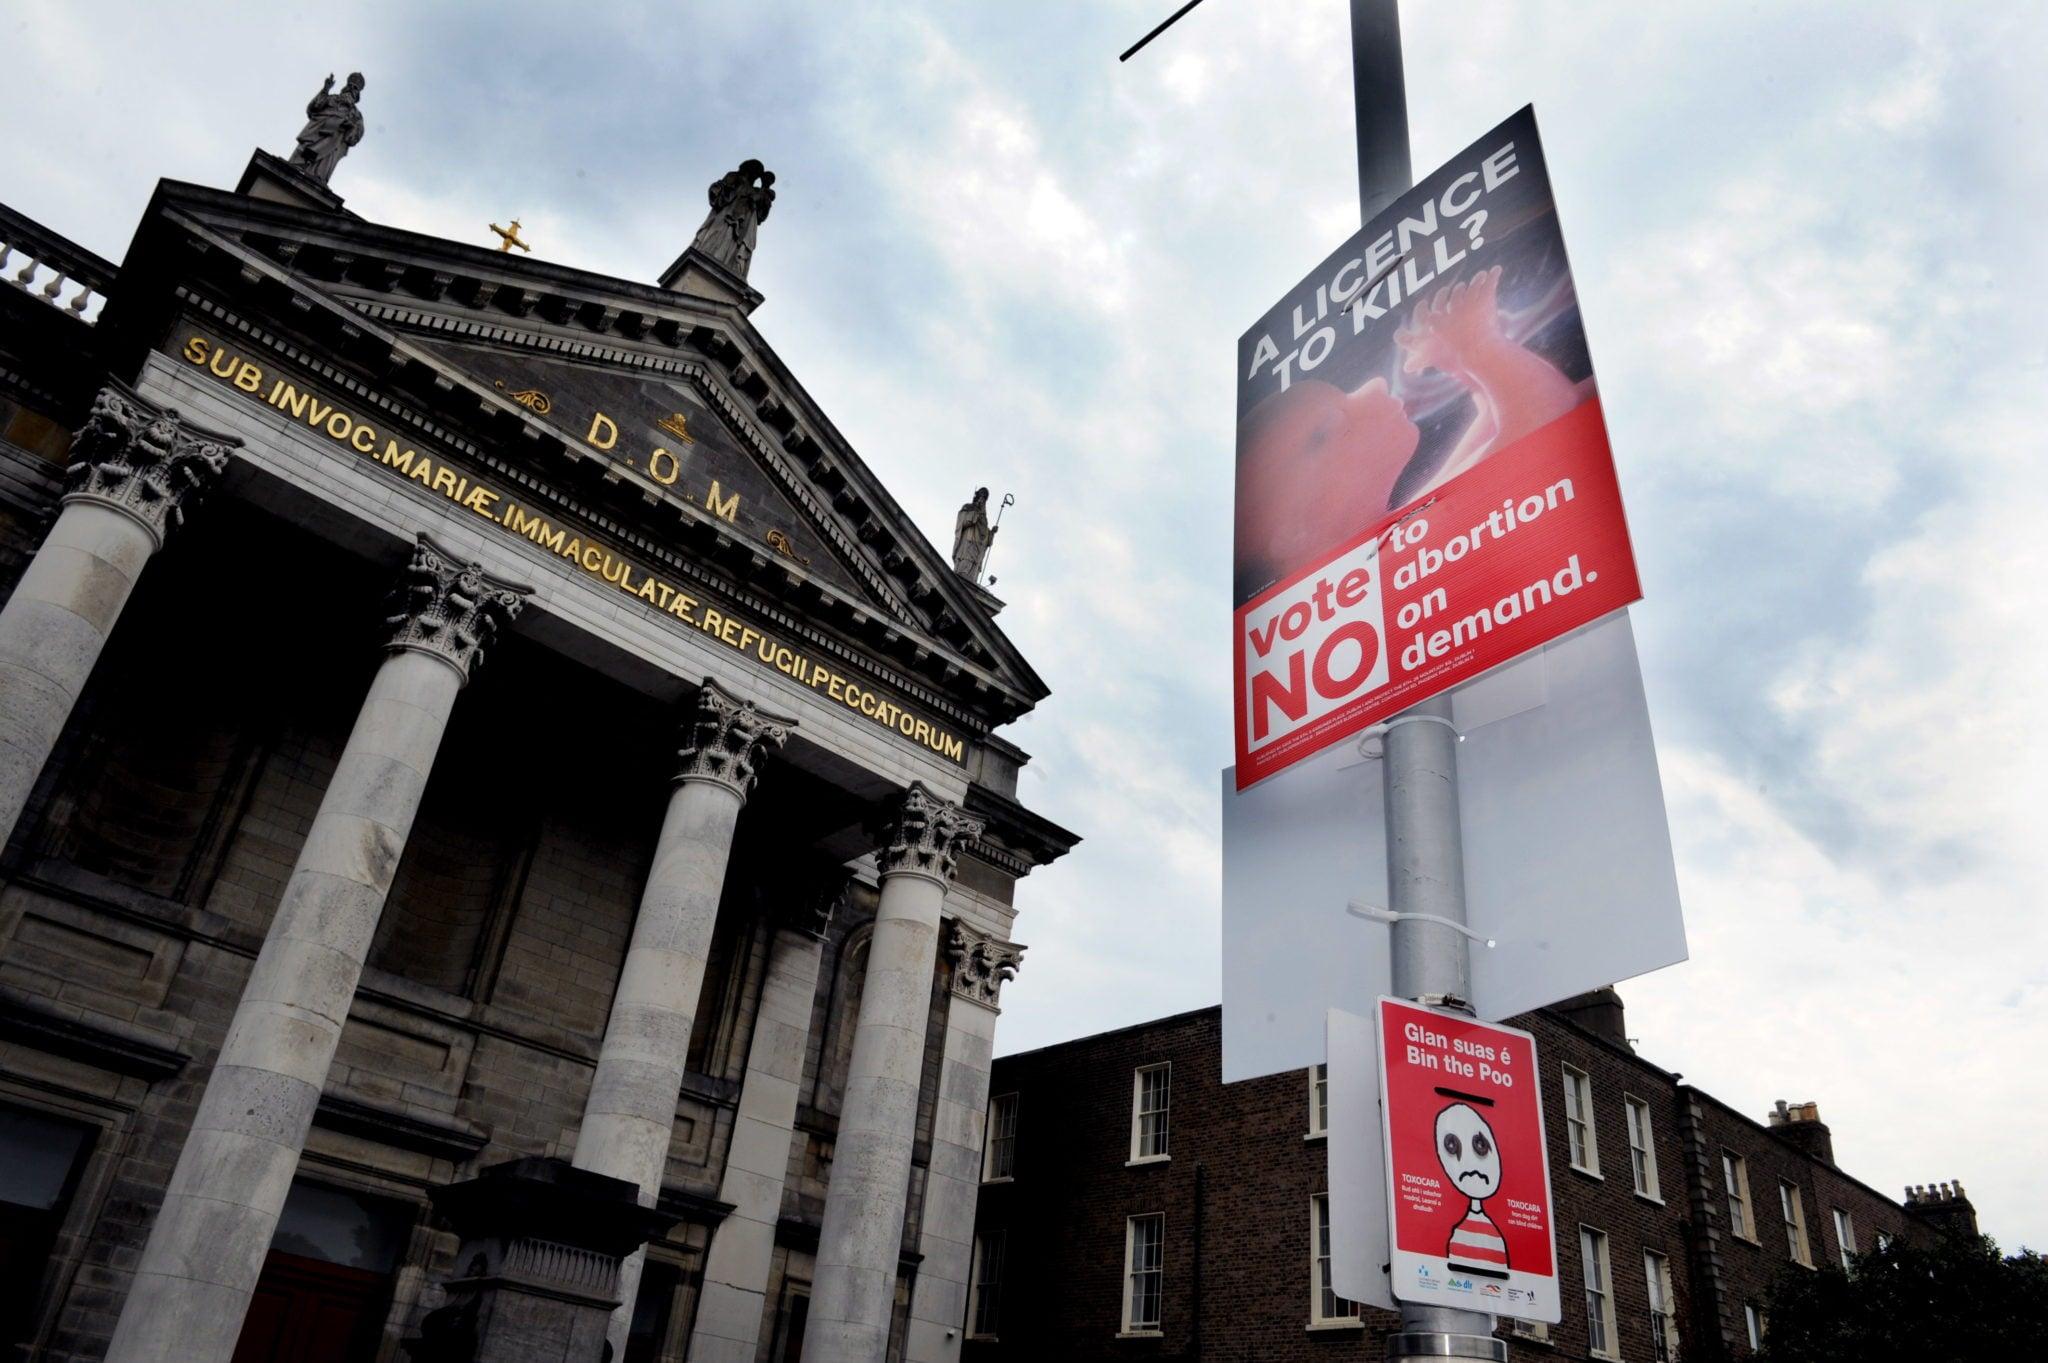 referendum dotyczące aborcji, Irlandia